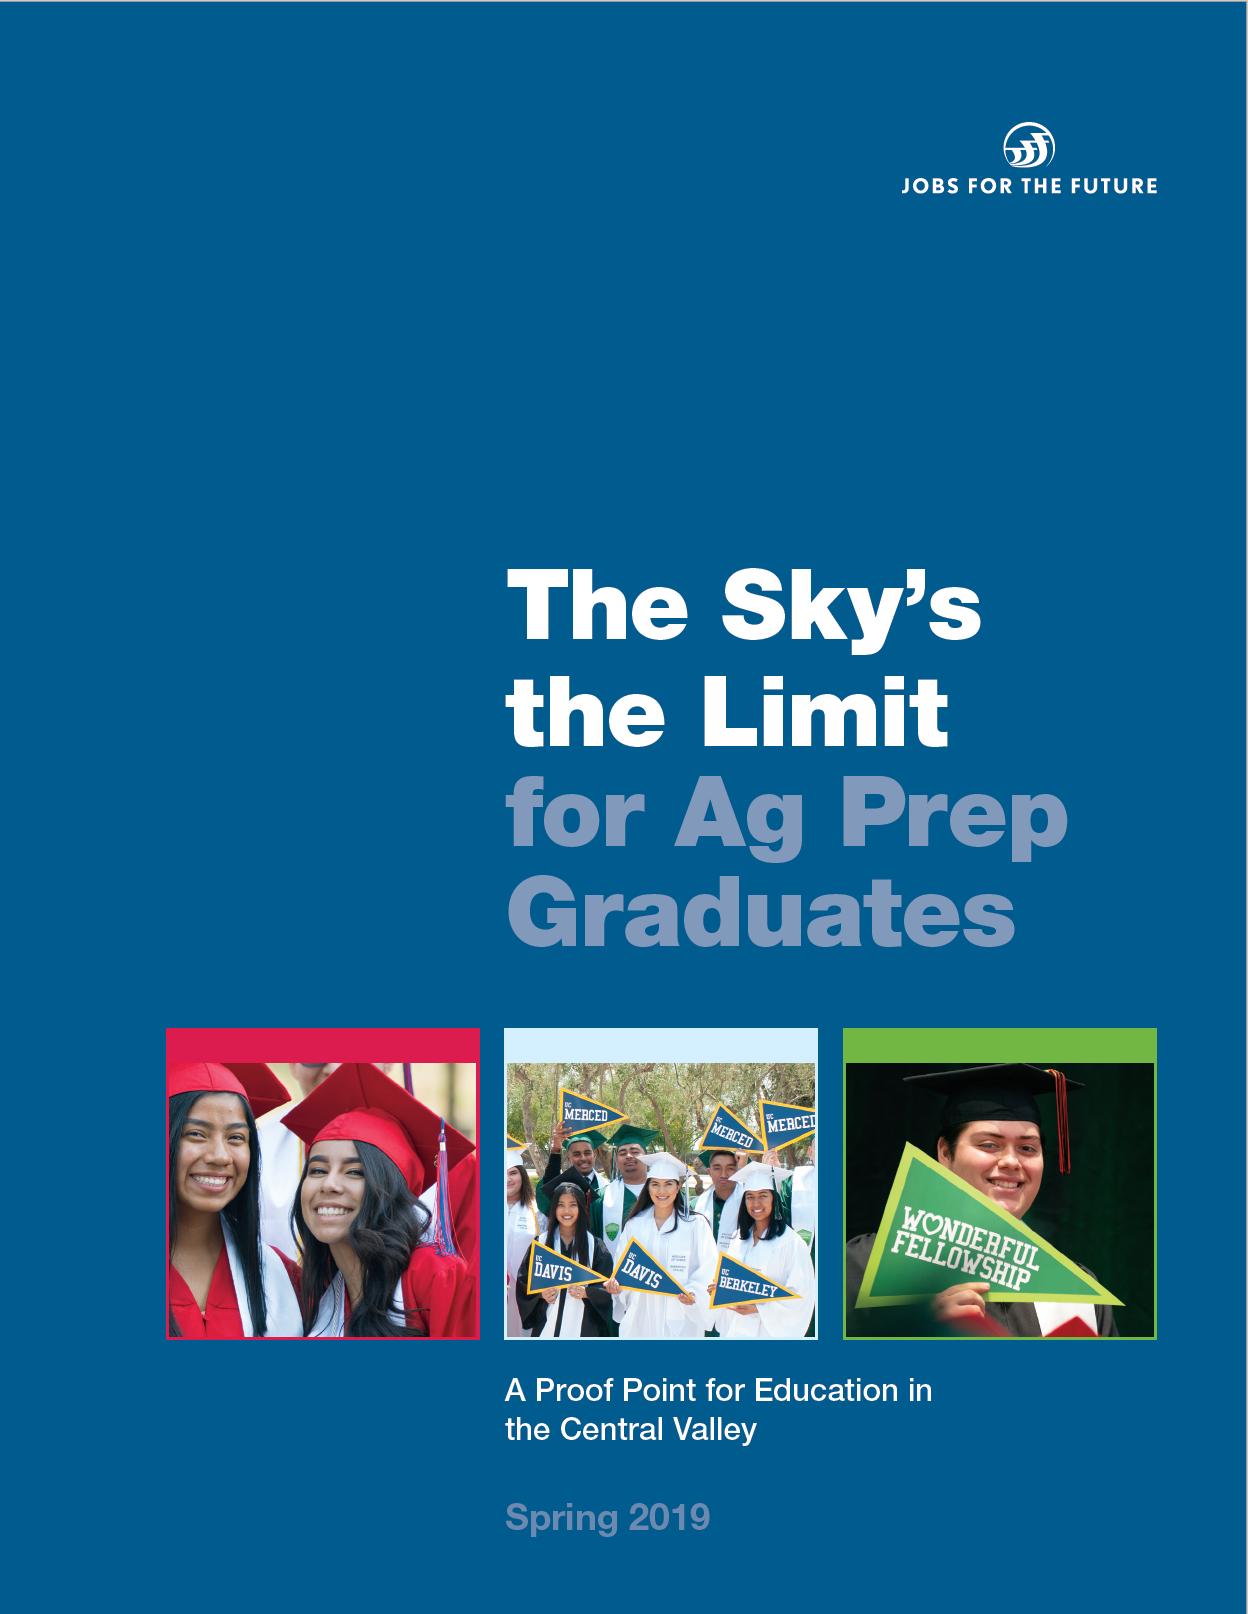 The Sky's the Limit for Ag Prep Graduates